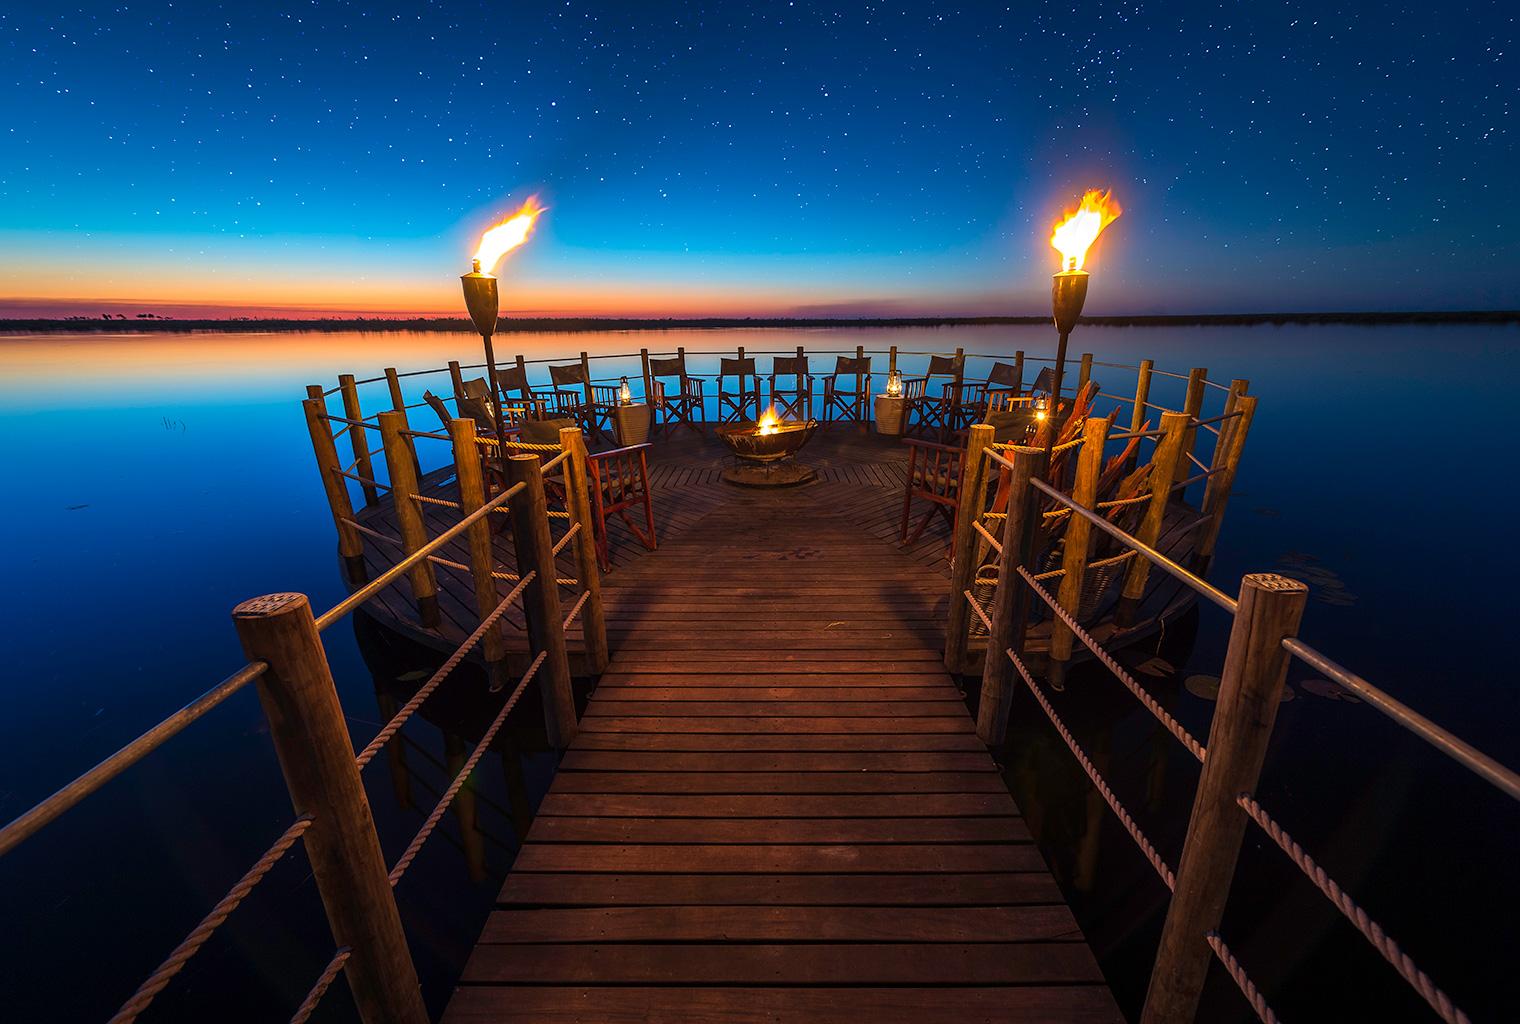 Duma-Tau-Lodge-Botswana-Fire-Circle